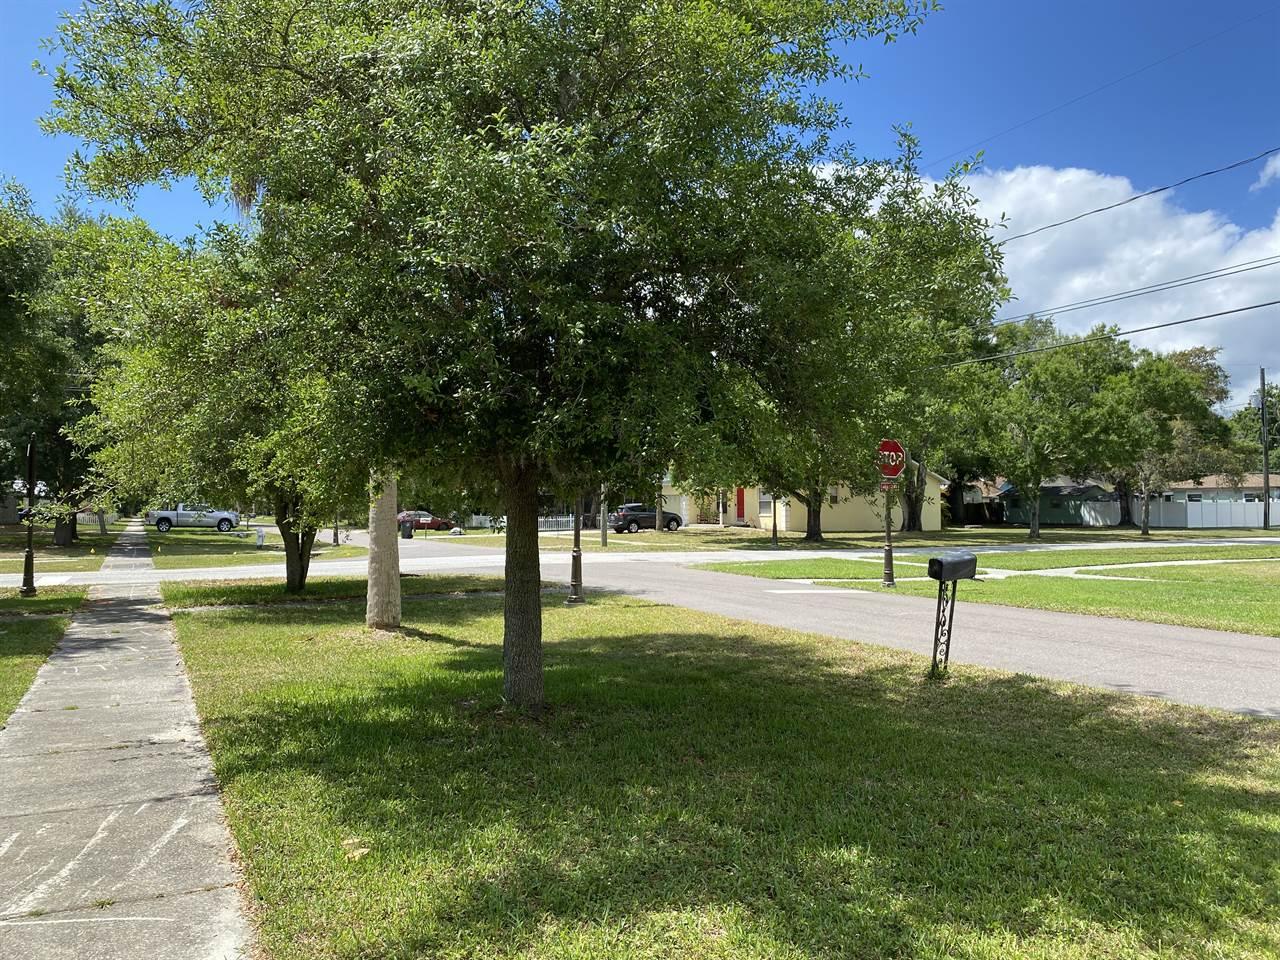 211 Jefferson Avenue South, Oldsmar, FL 34677